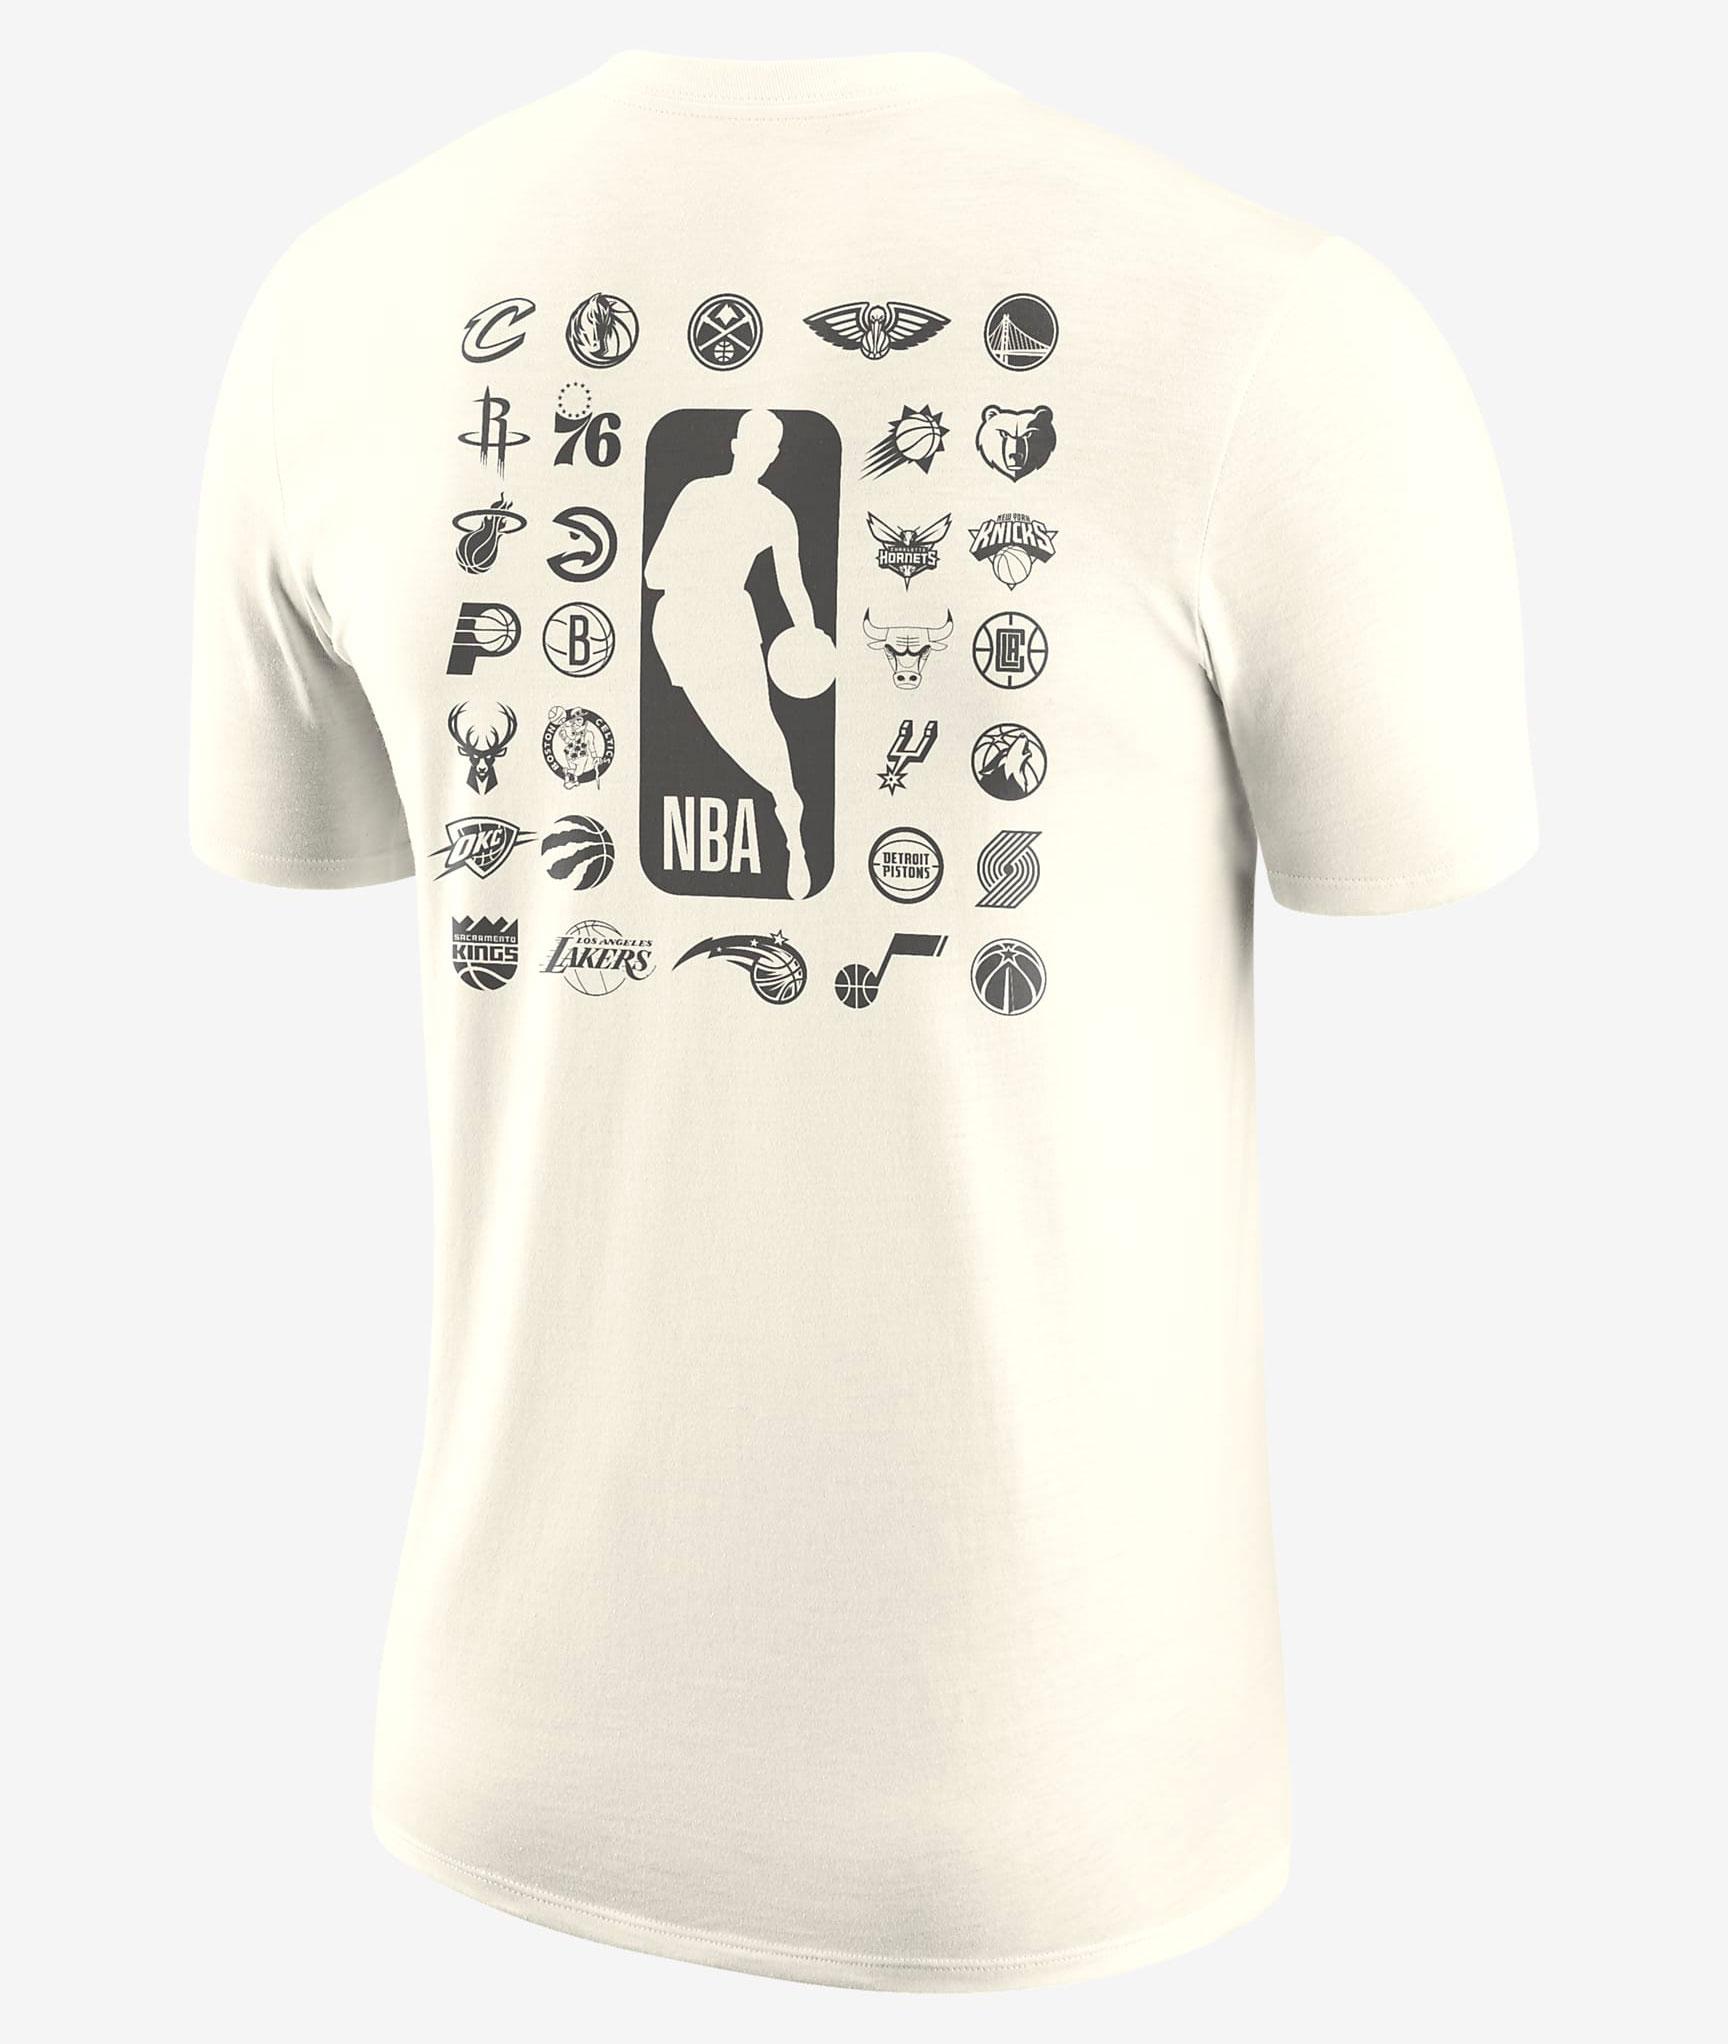 nike-nba-team-31-t-shirt-2